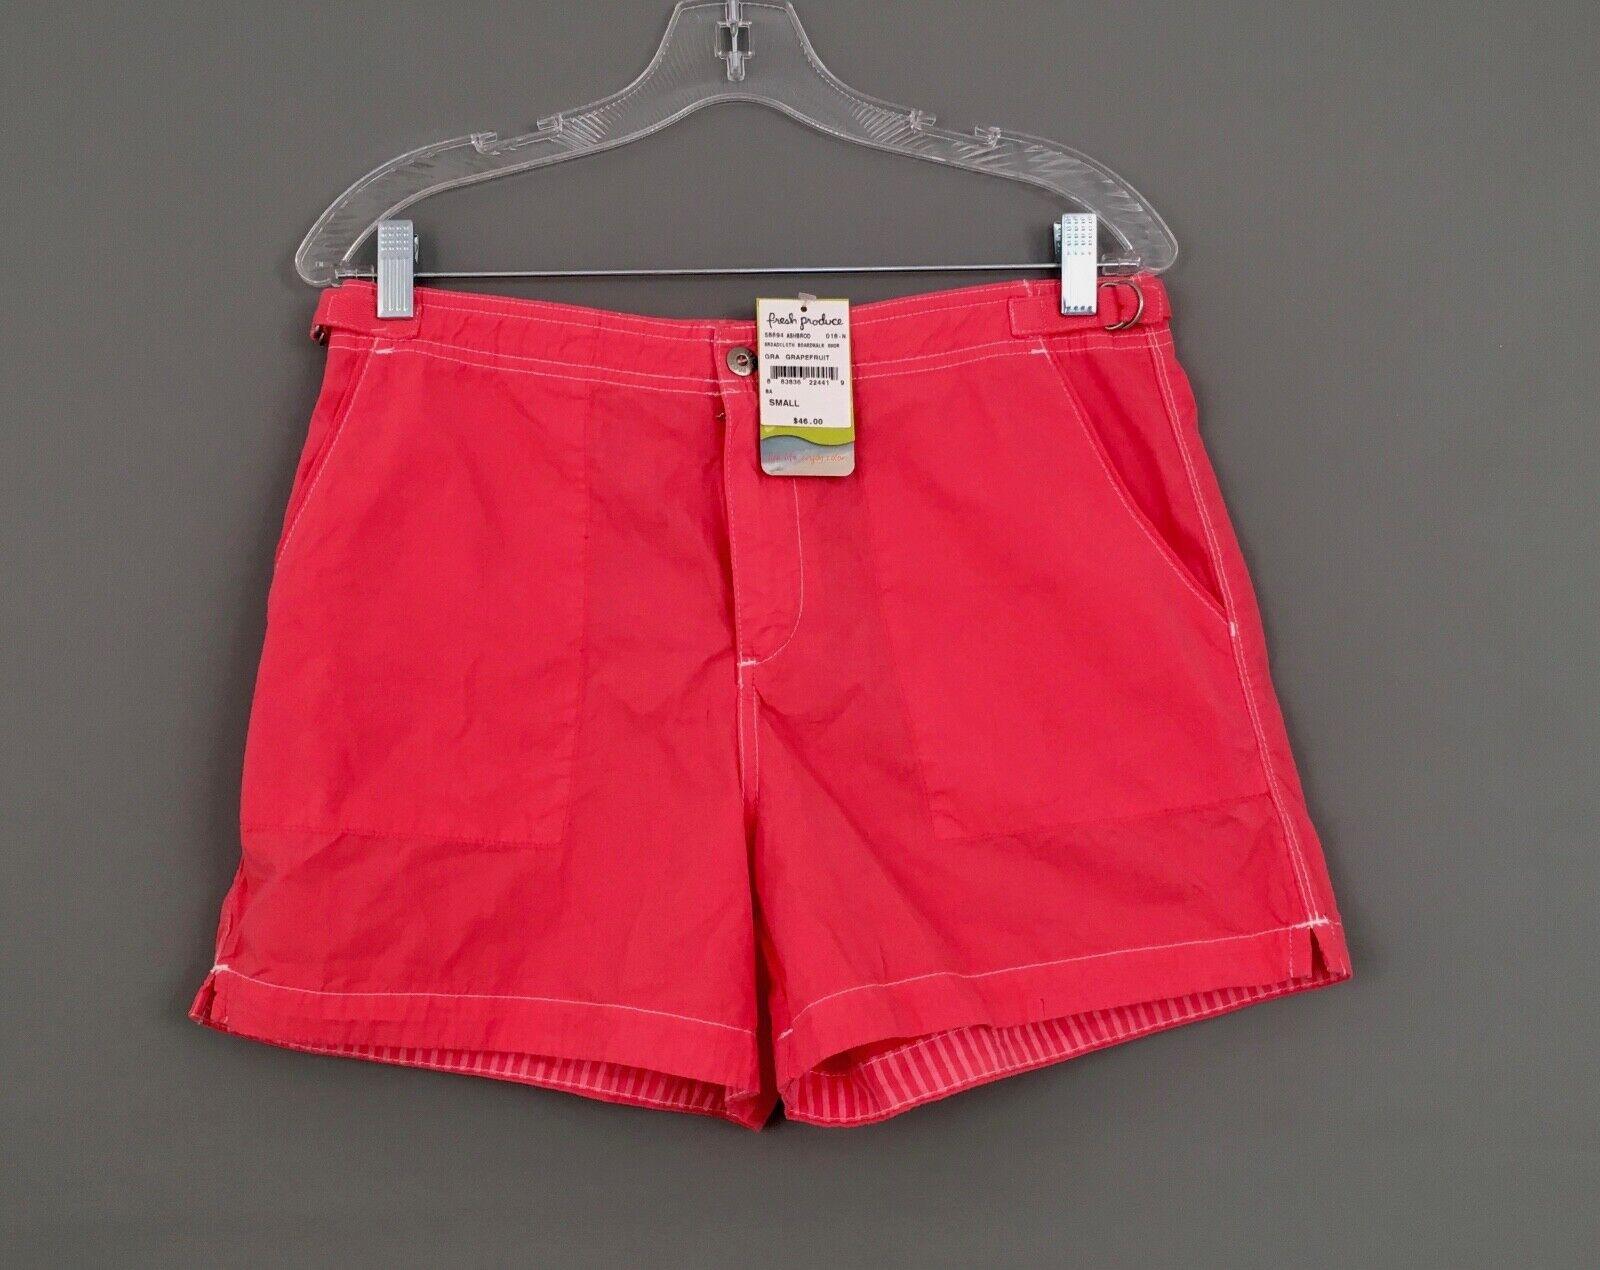 NWT  46 FRESH PRODUCE Women's Sz.Small Grapefruit Pink Boardwalk Shorts